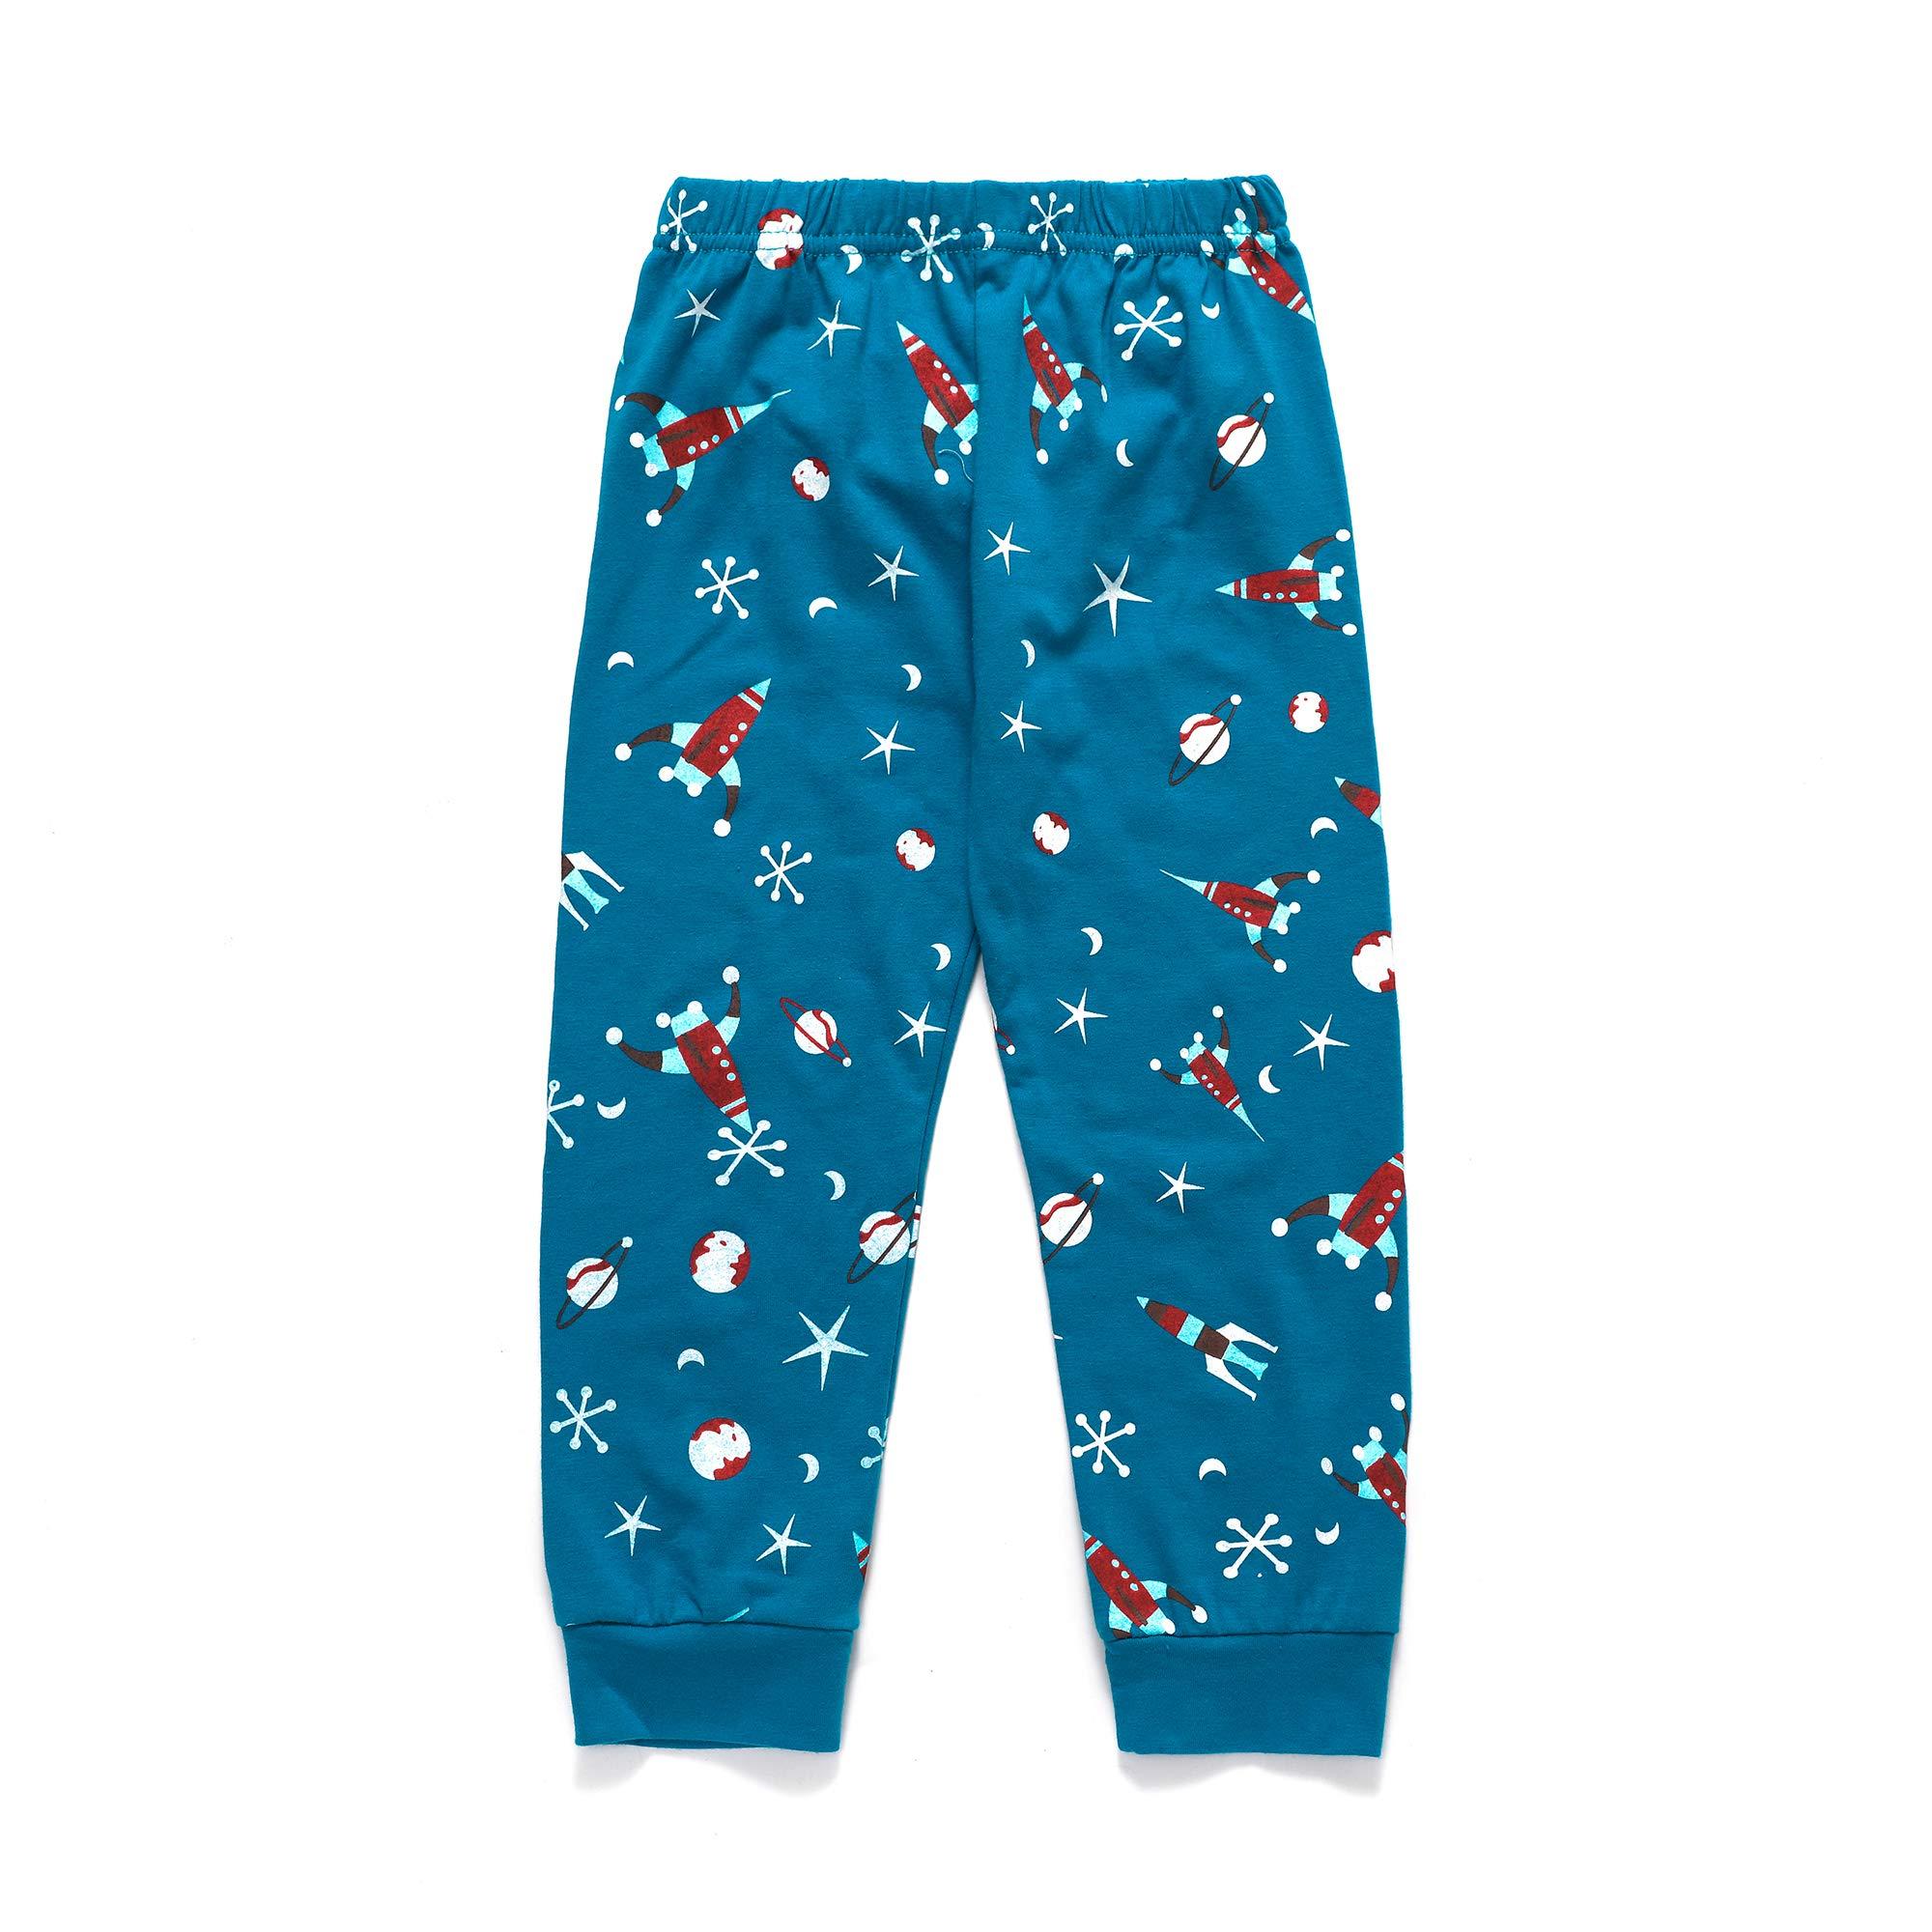 Tarkis Boys Novely Pyjamas Set Cartoon Dinosaur Nightwear Sleepwear Long Sleeve Pjs Outfit Ages 2 to 7 Years